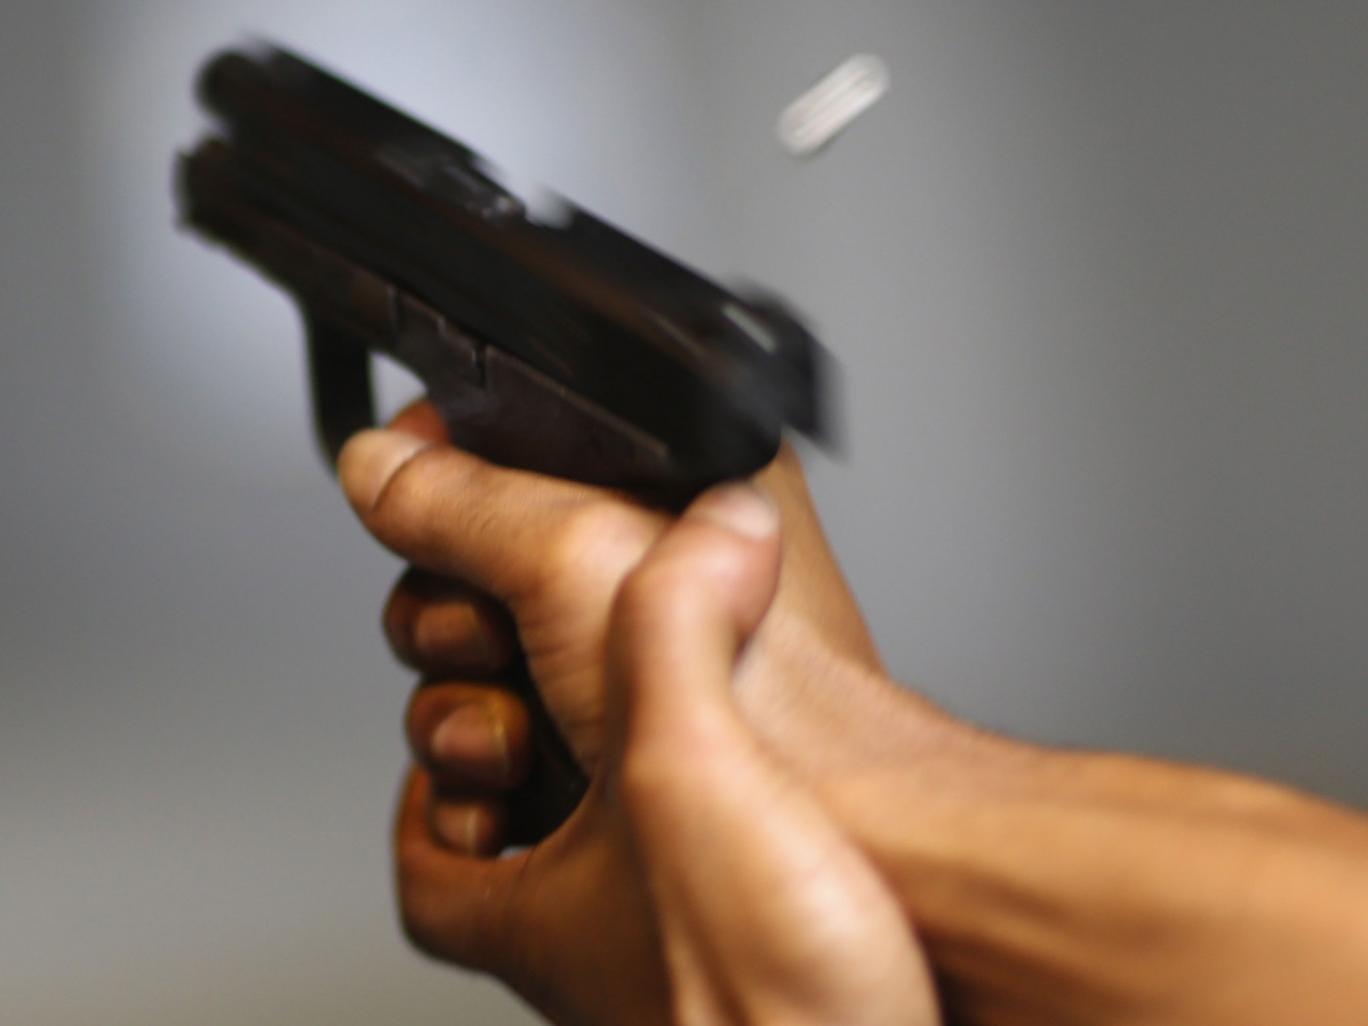 POMPANO BEACH, FL - APRIL 11: As the U.S. Senate takes up gun legislation in Washington, DC , a handgun is used on the indoor firing range at the National Armory gun store on April 11, 2013 in Pompano Beach, Florida. The Senate voted 68-31 to begin debate